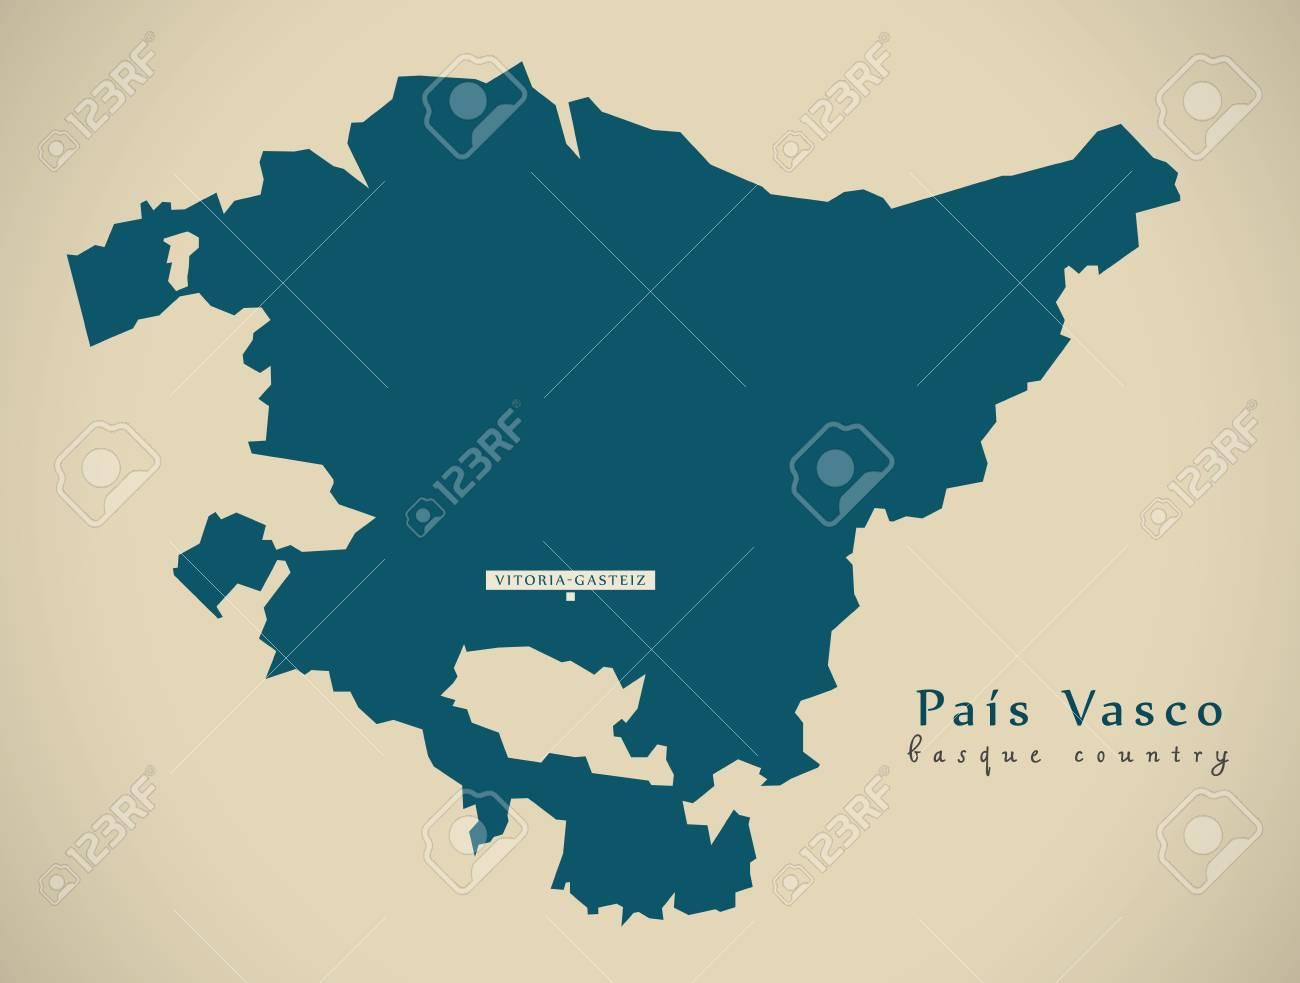 Modern Map Pais Vasco Spain Es Illustration Stock Photo Picture